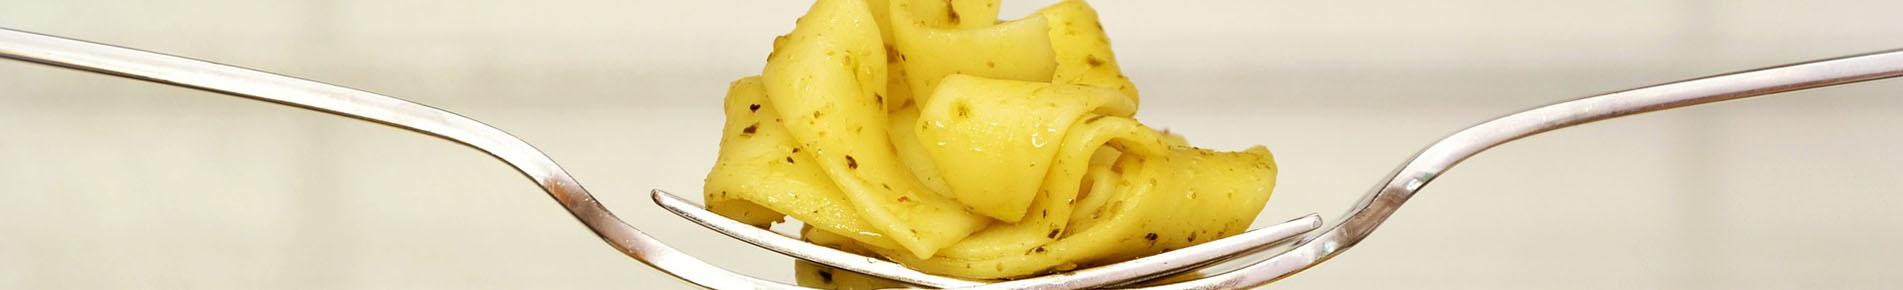 Zucchini Tagliatelle Kochen im Serviced Apartment